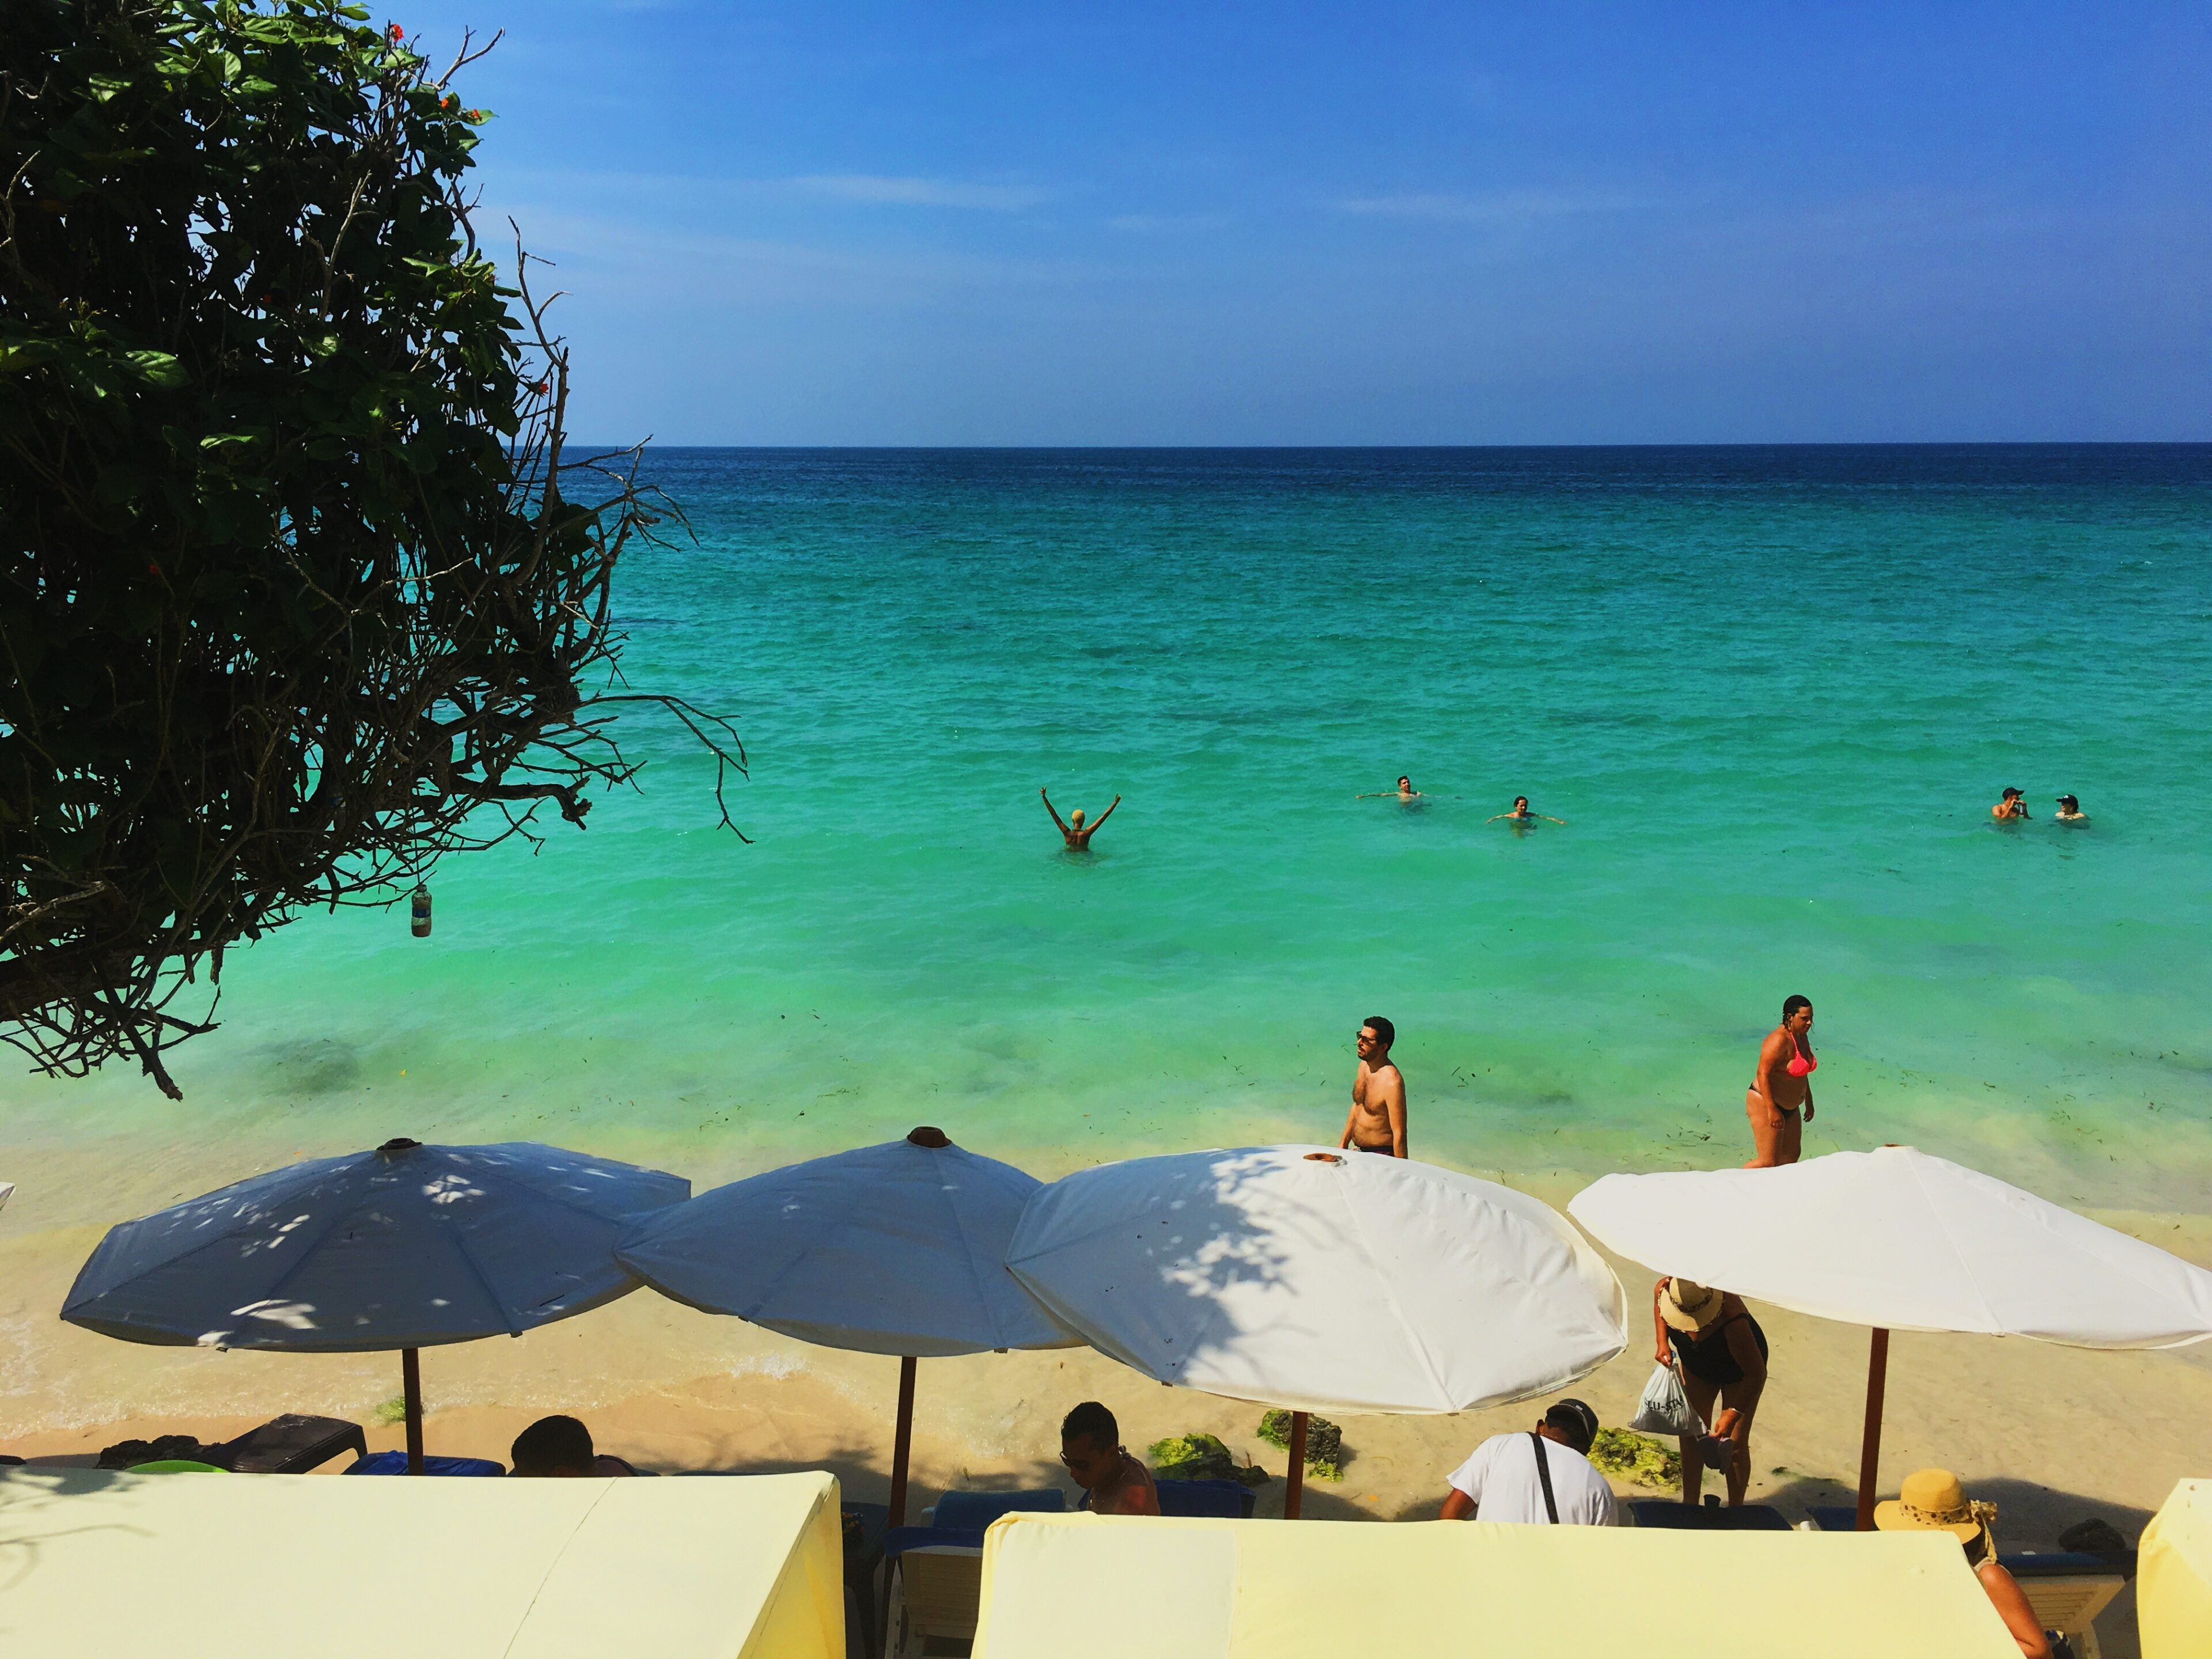 lcm-liveclothesminded-colombia-cartagena-playa blanca-beach